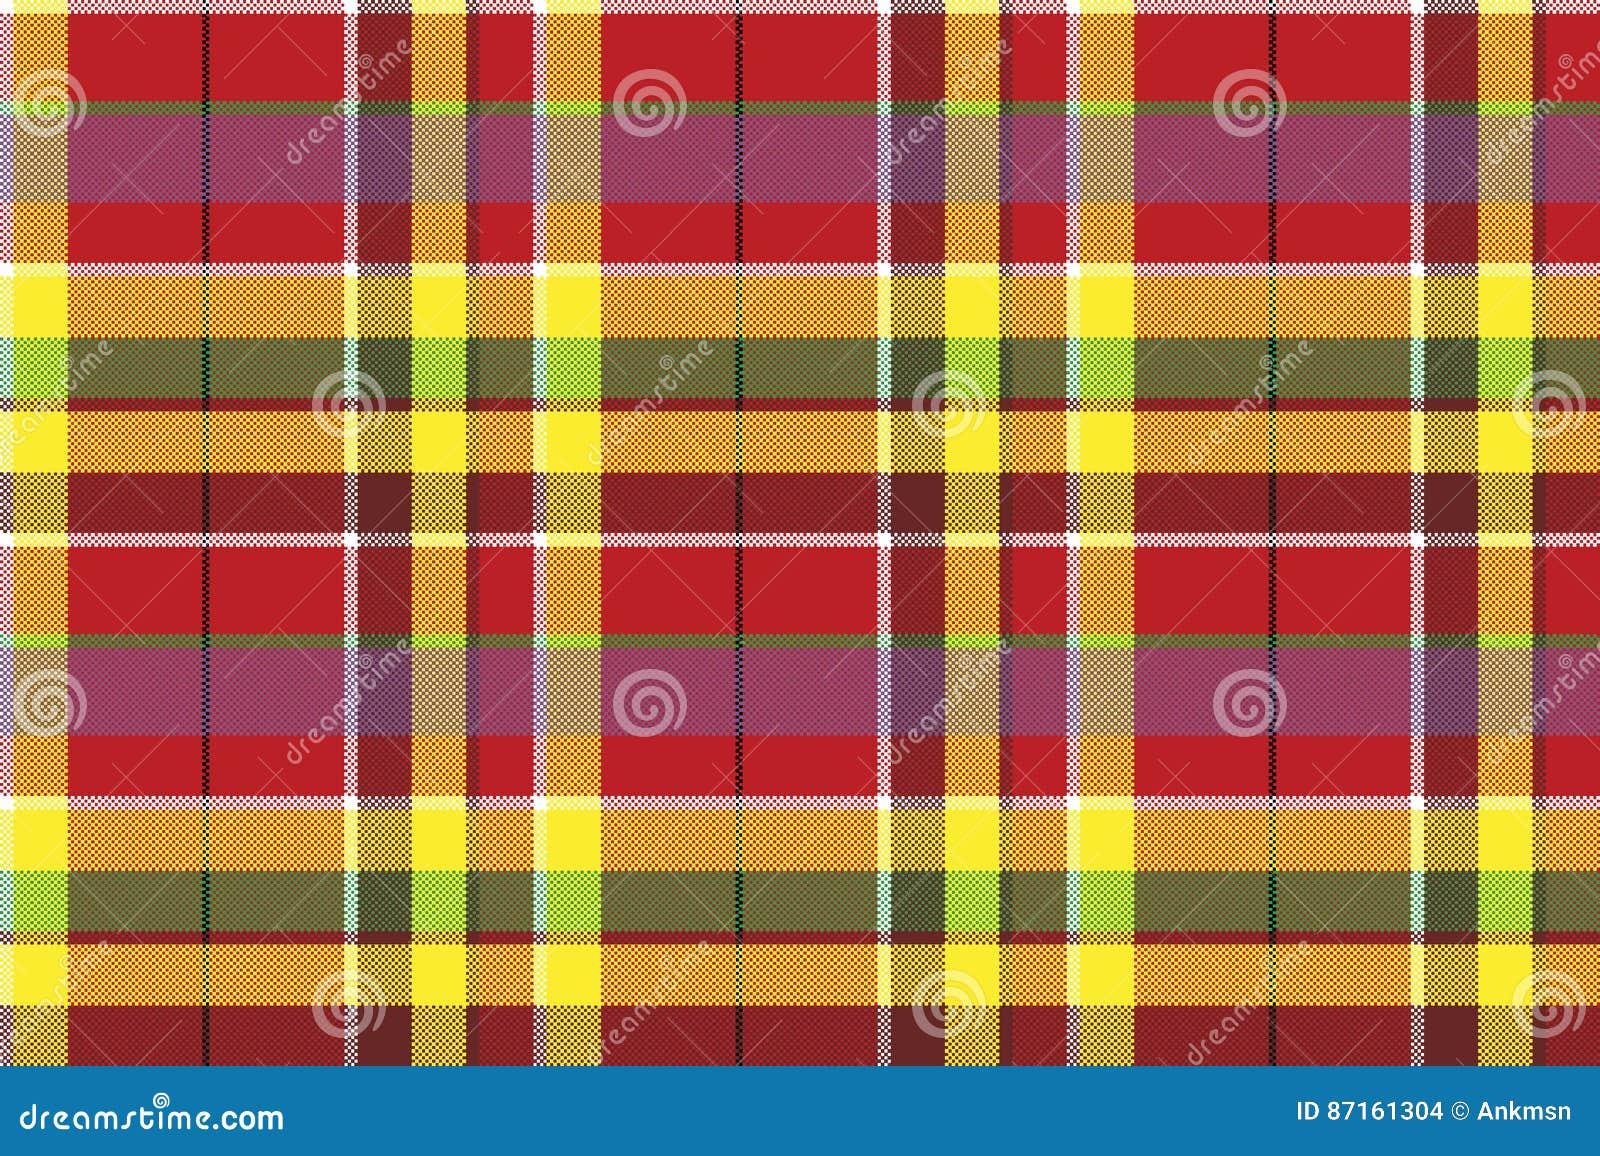 Check Tartan Plaid Fabric Seamless Pattern Texture ...